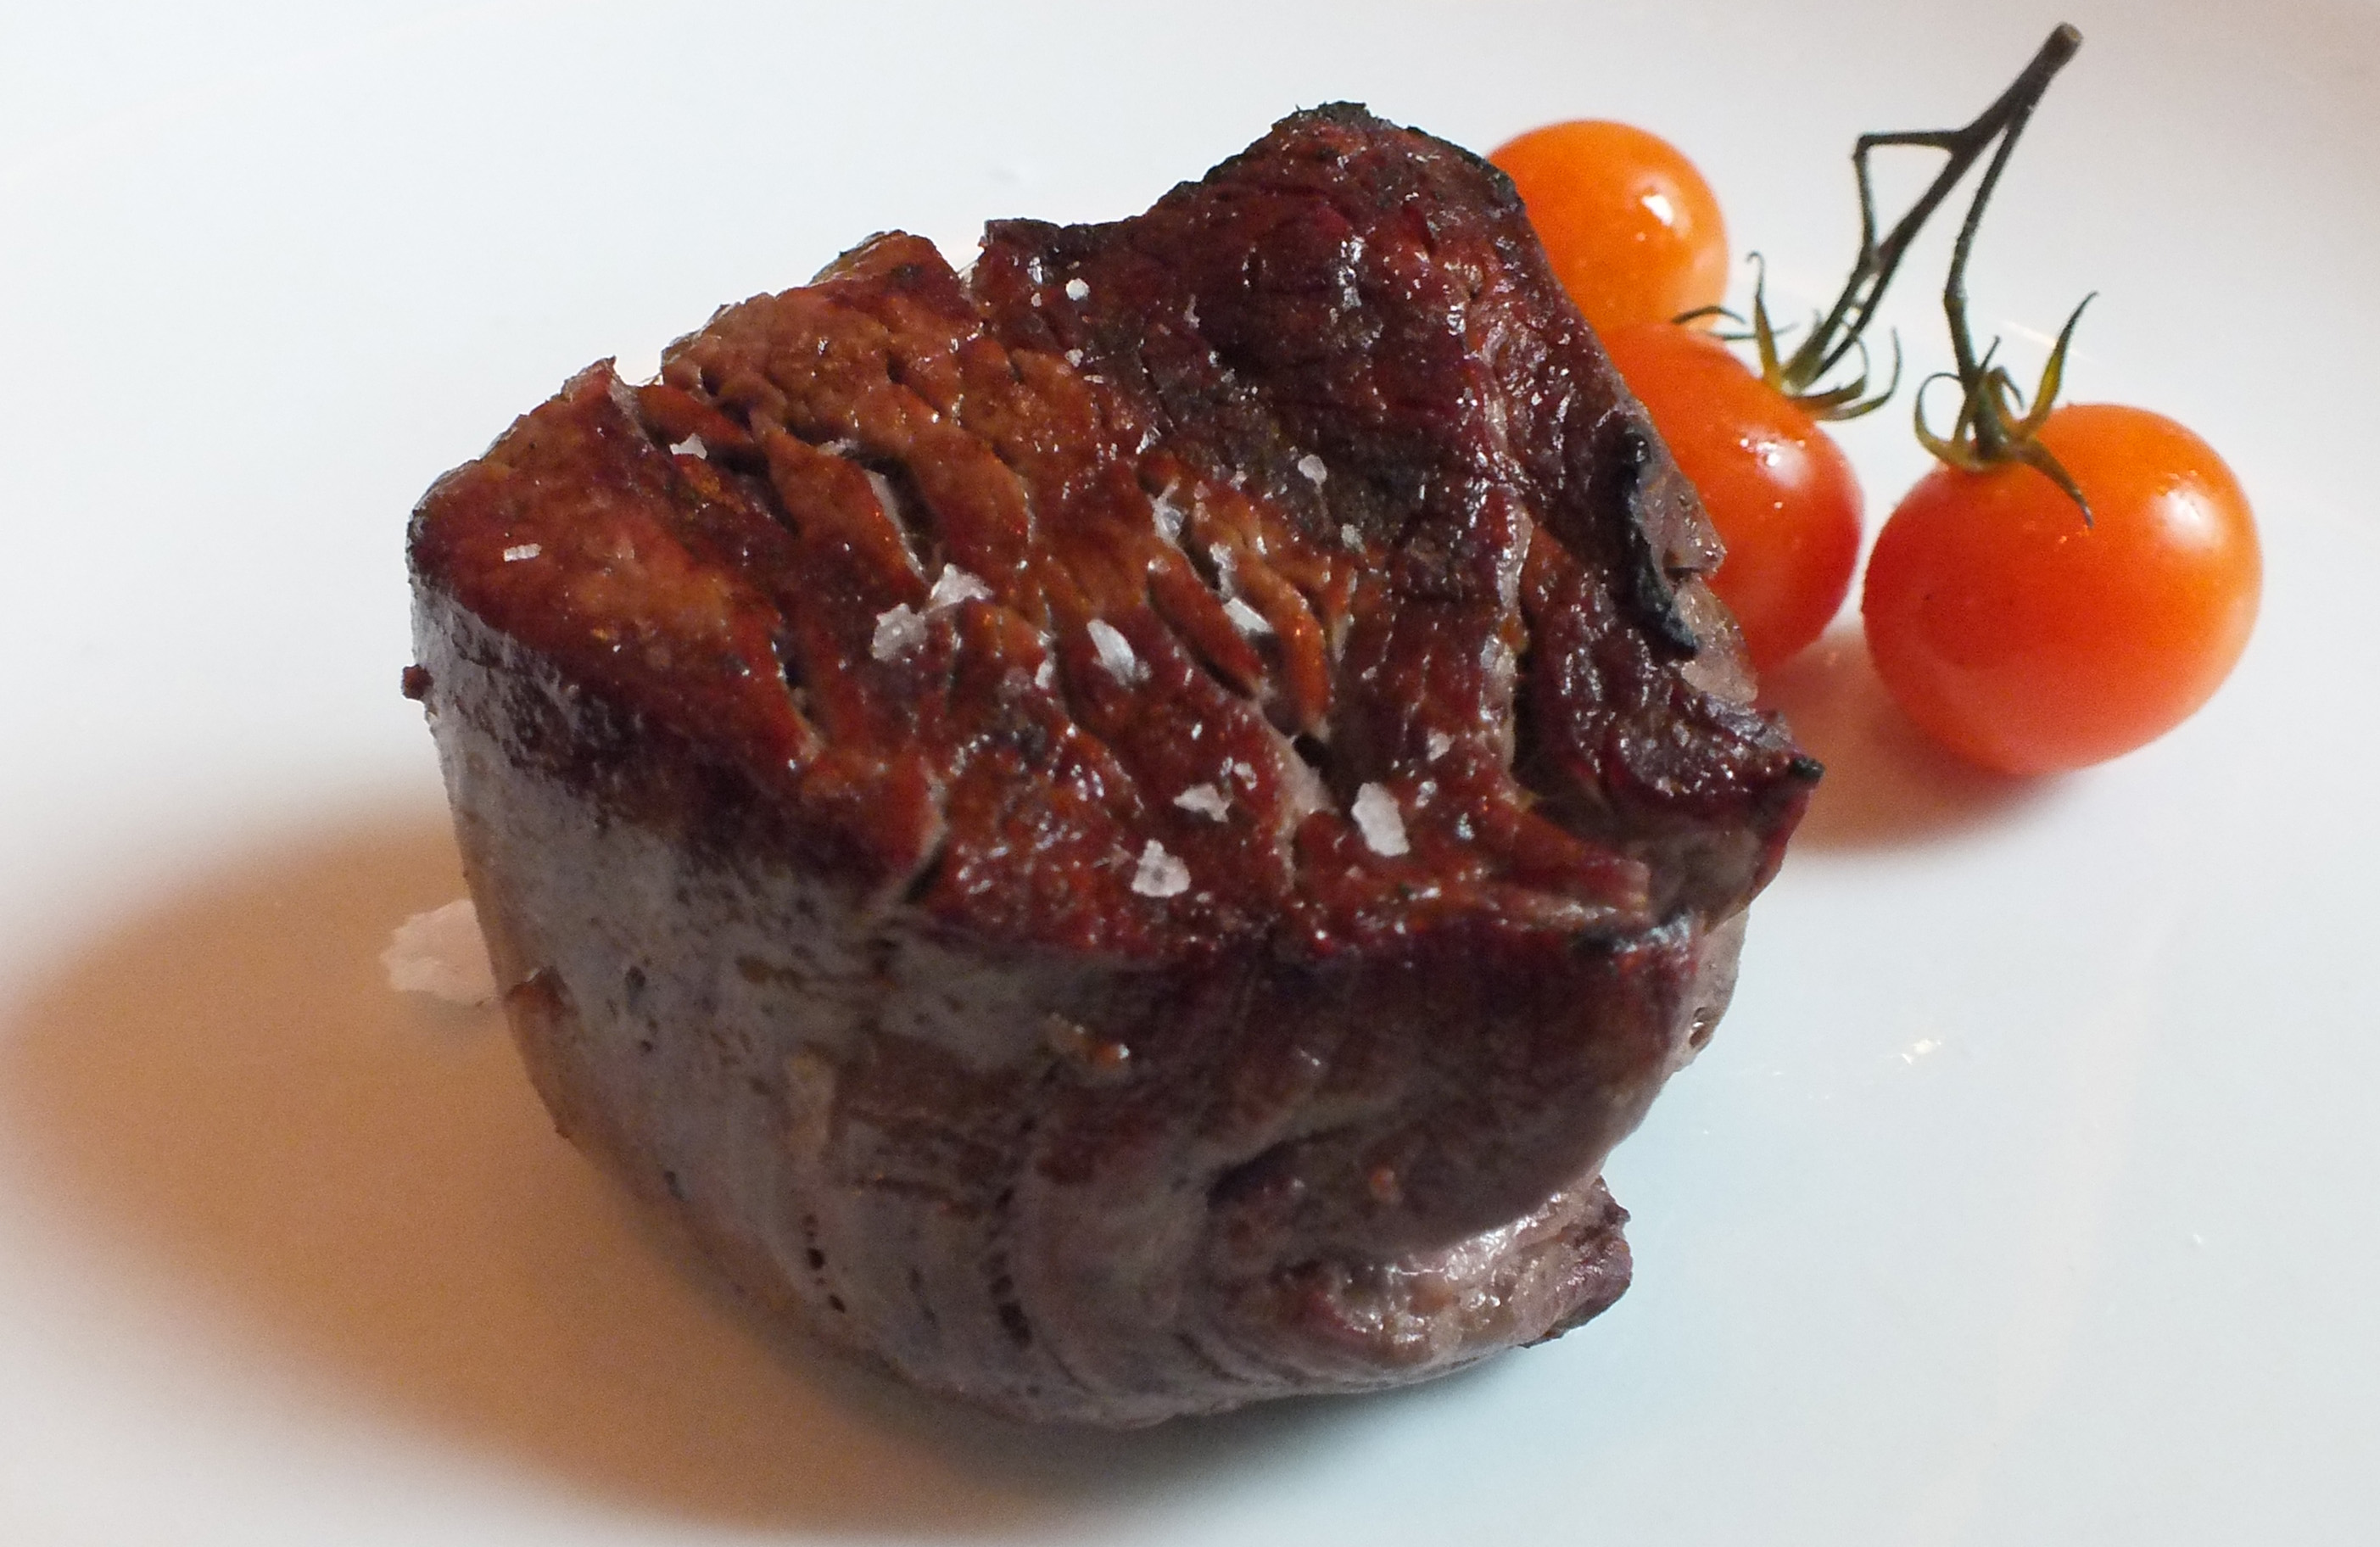 JW Steakhouse Mayfair 6oz fillet